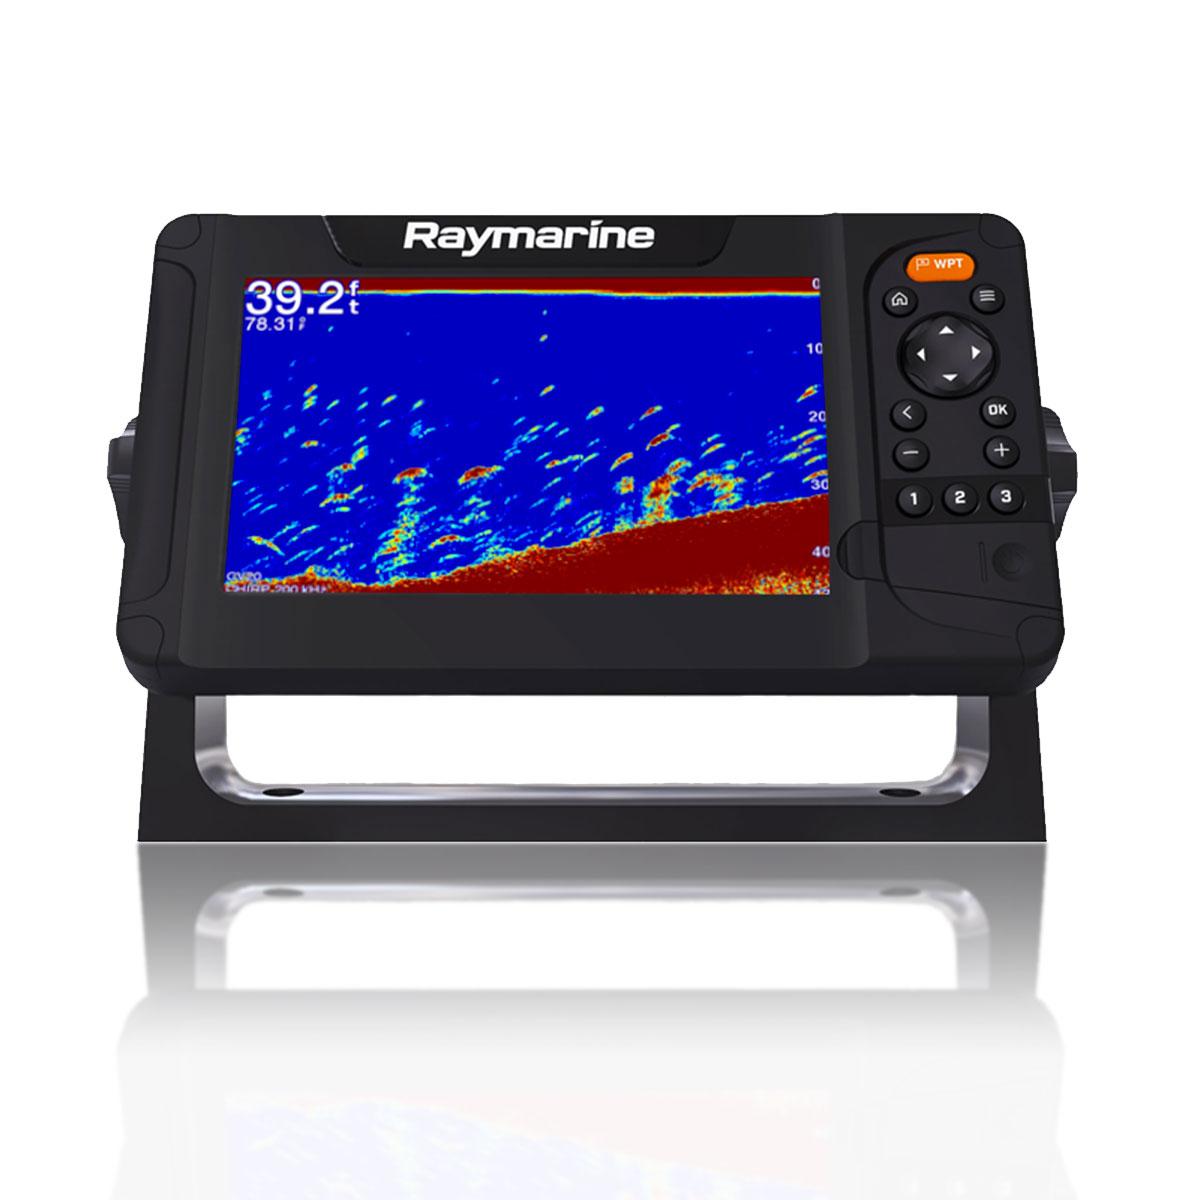 Afficheur multifonction ELEMENT 7S Raymarine